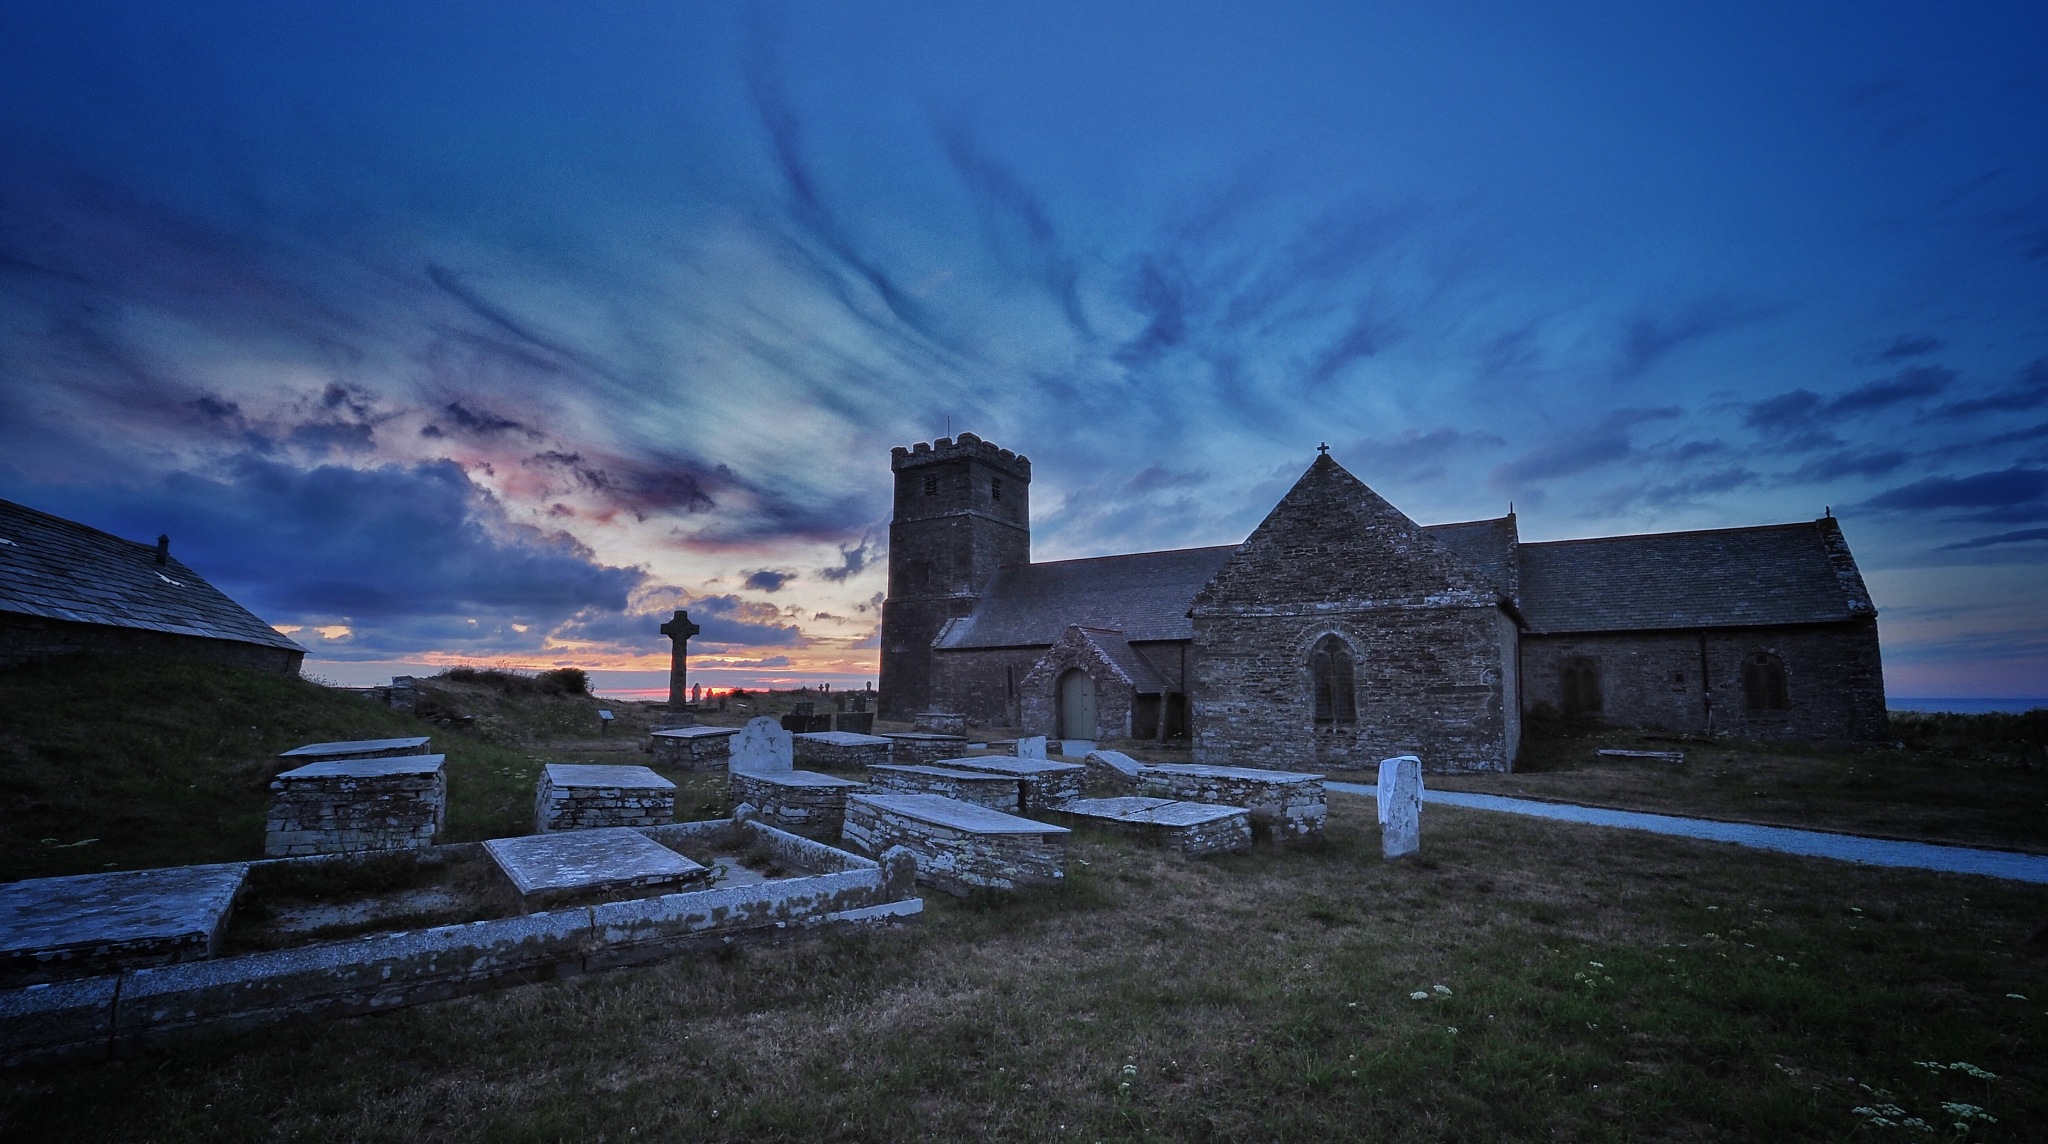 St Materiana's Church, Tintagel by Derek Thompson